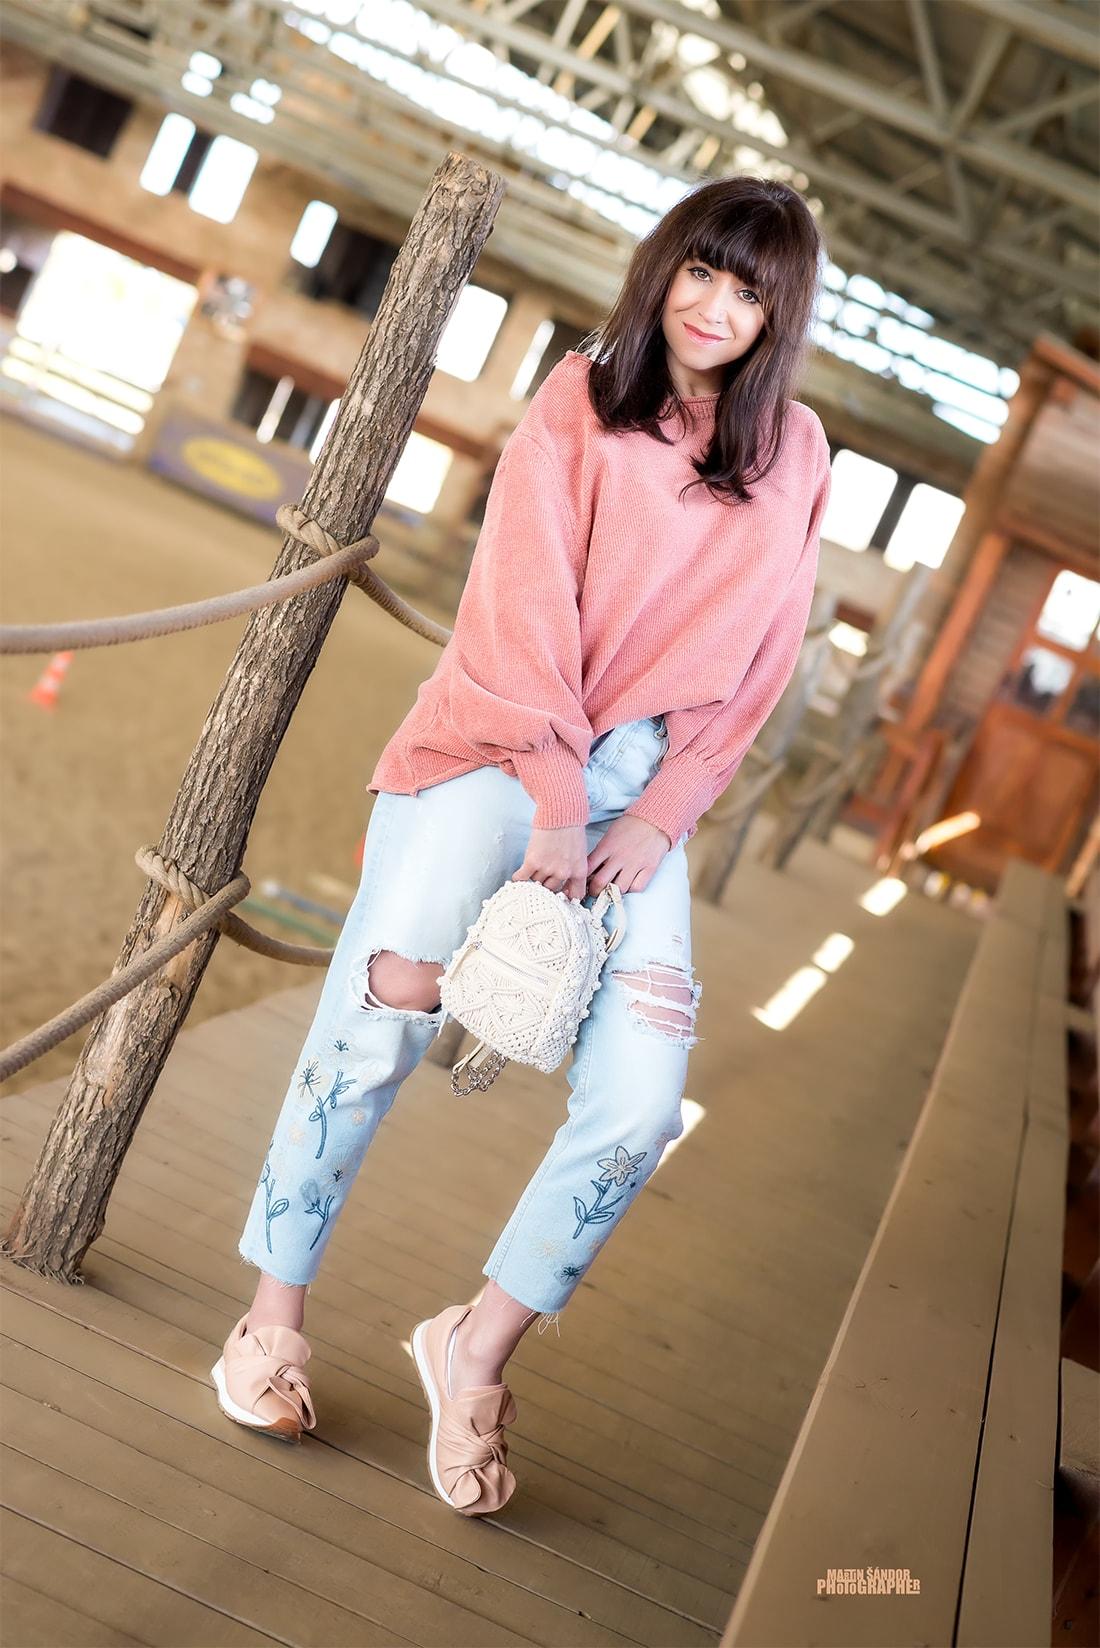 SPOMIENKA NA SVETER VĎAKA ZARE_Katharine-fashion is beautiful_Blog 7_Ženilkový sveter zo Zary_Vyšívané džínsy_Tenisky s mašľou_Katarína Jakubčová_Fashion blogger